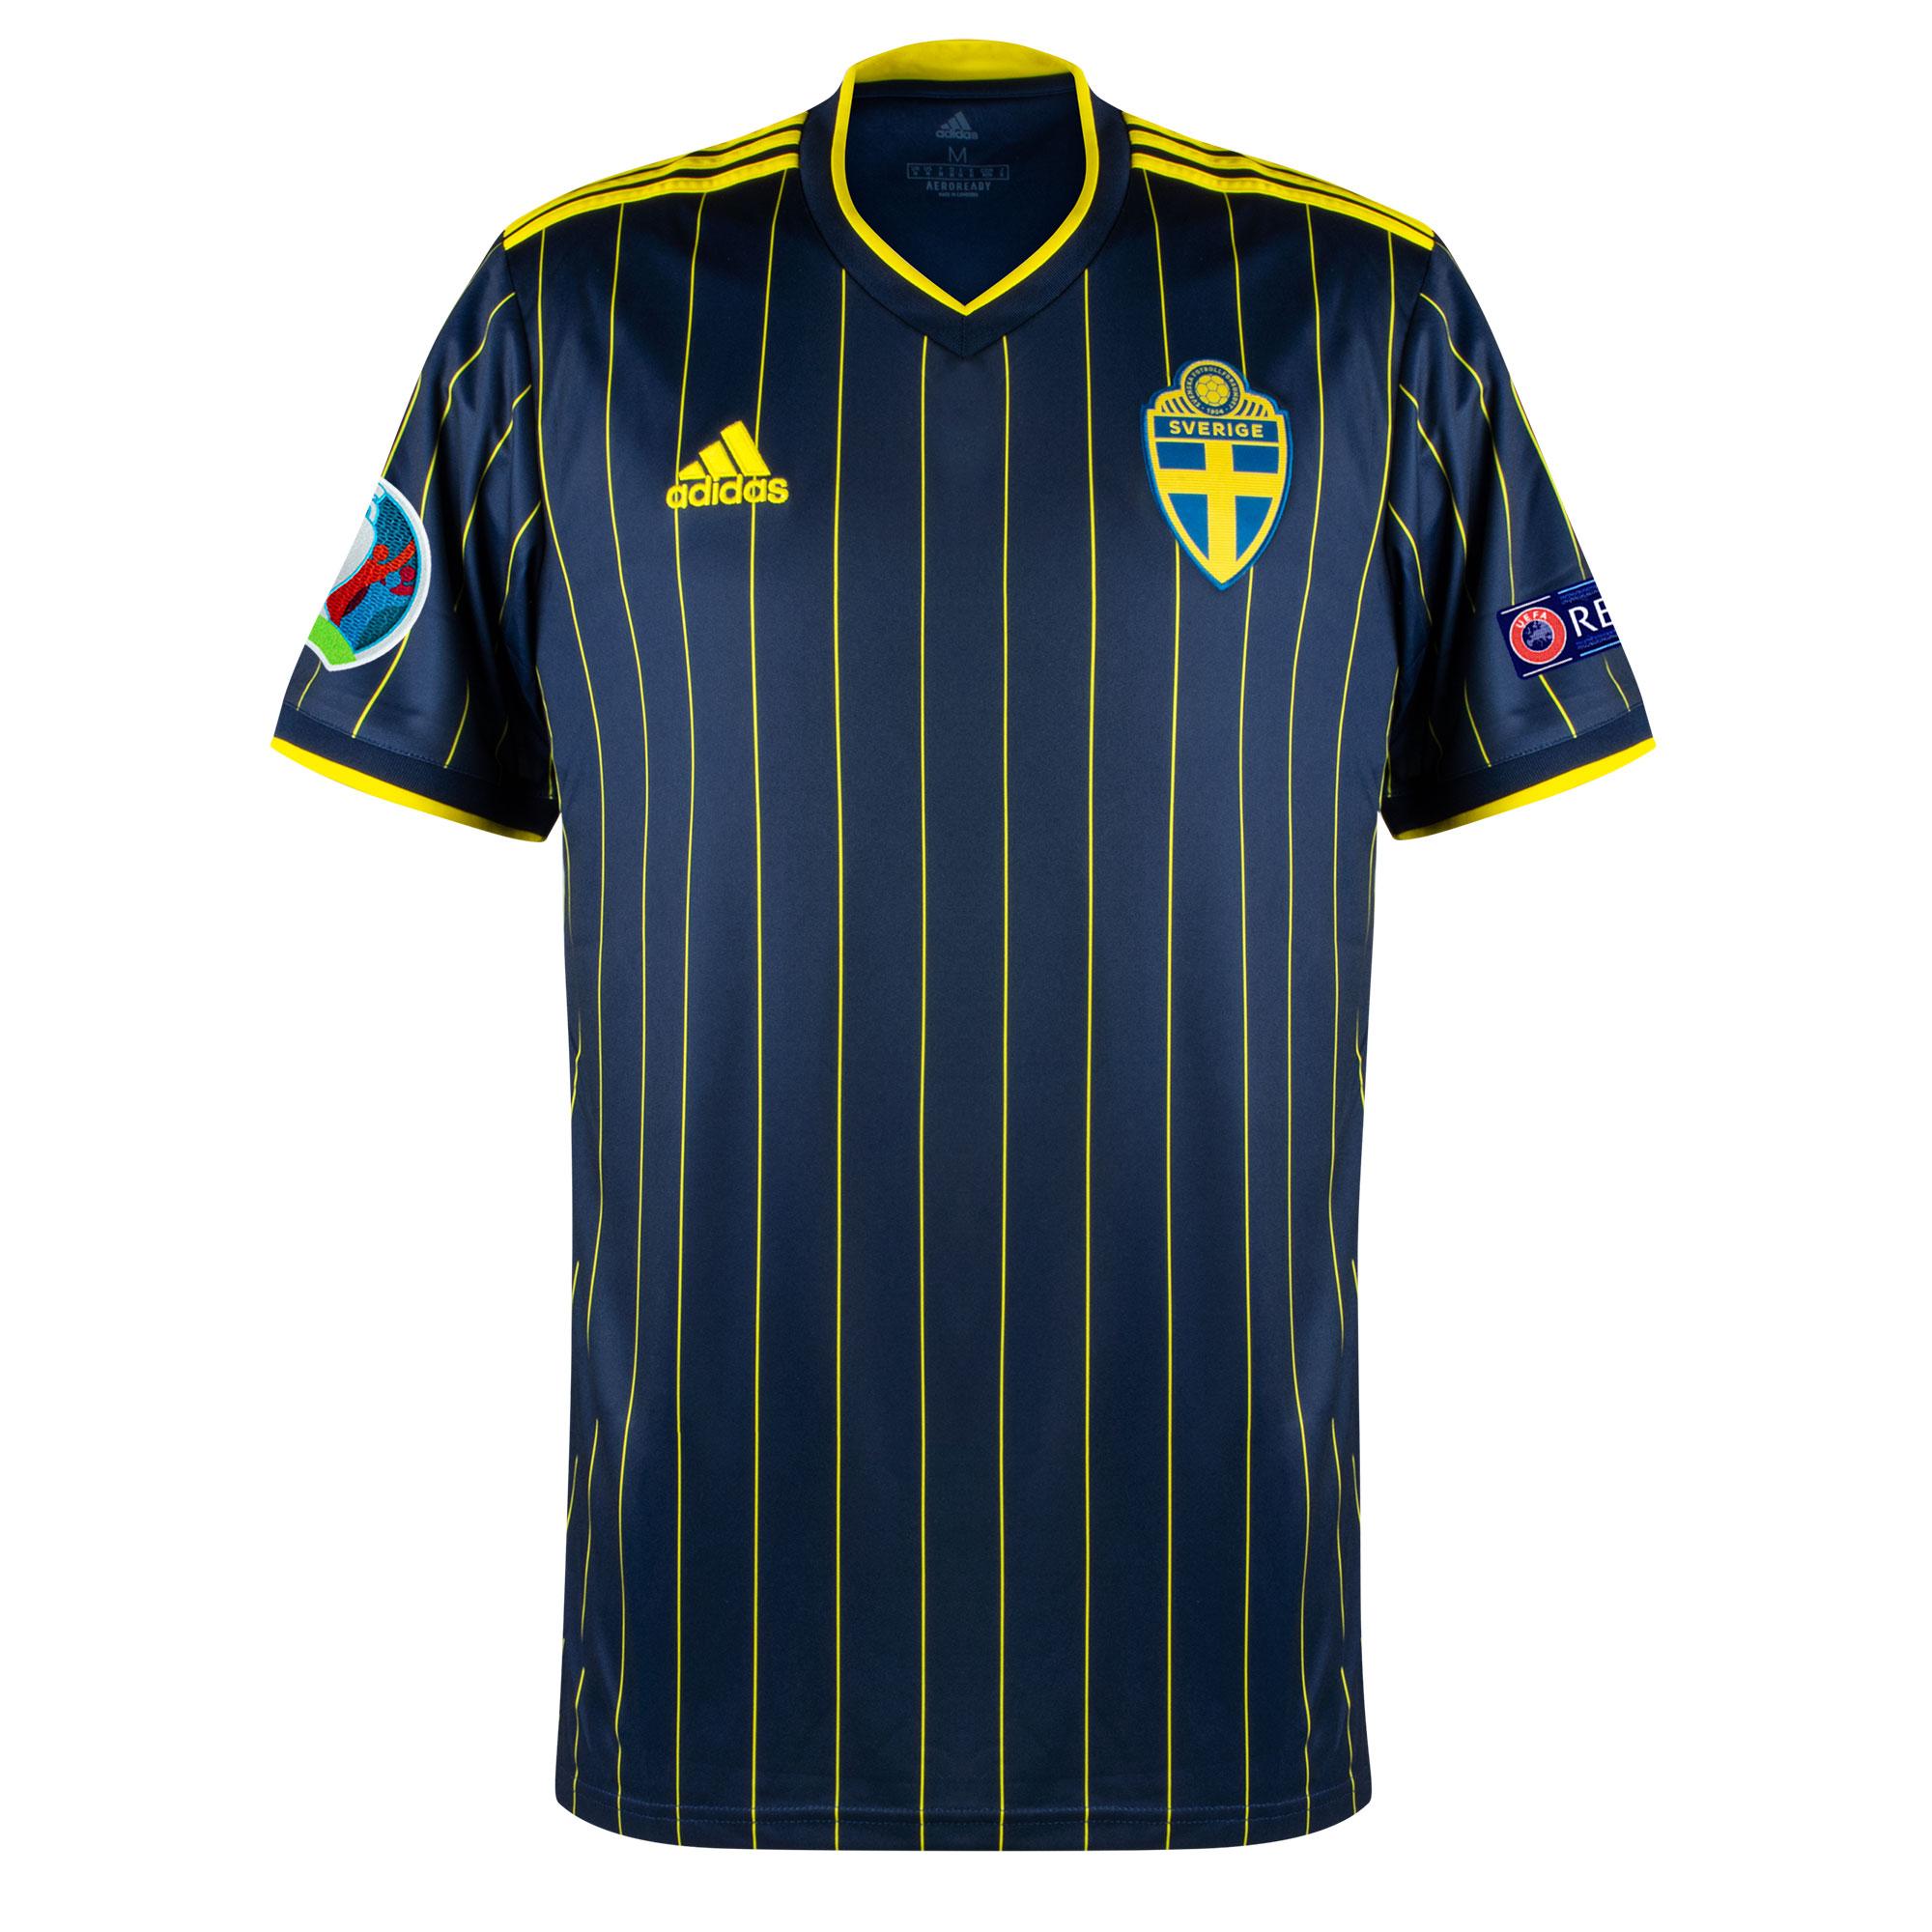 adidas Sweden Away Shirt inc. Official Euro 2020 & Respect Patches